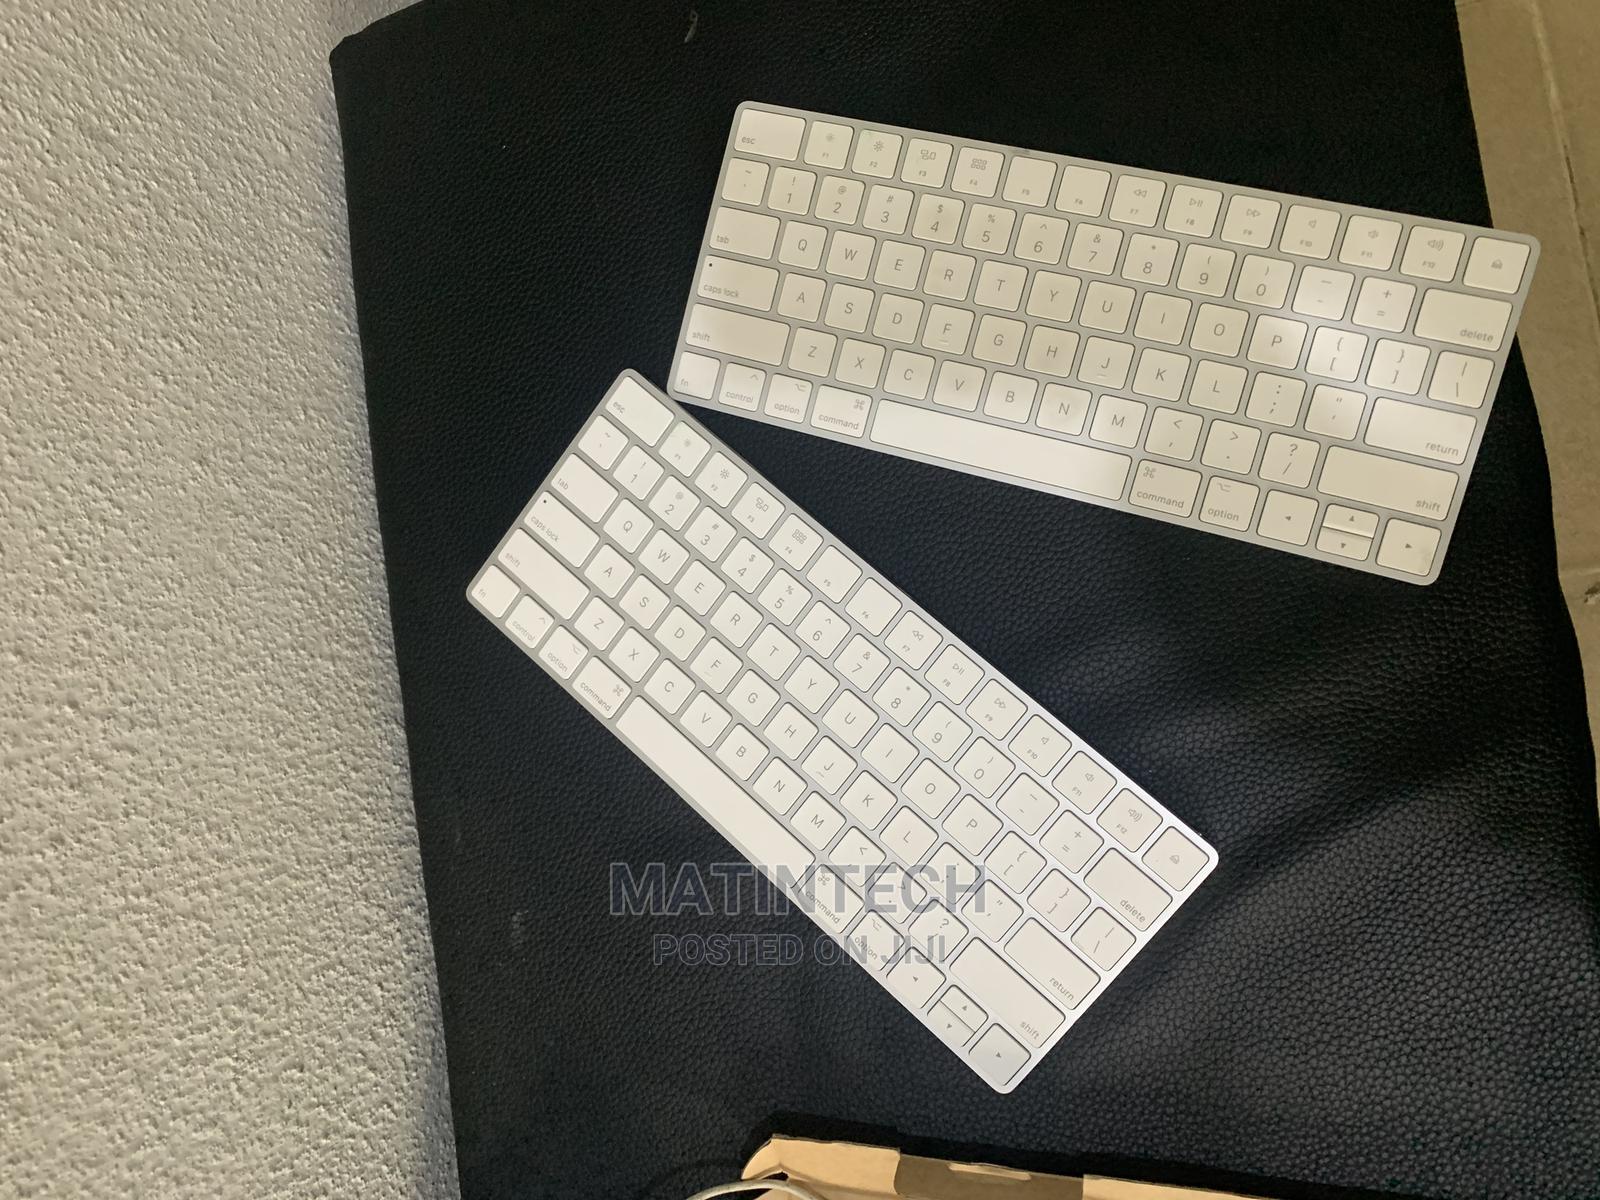 Apple iMac Magic Keyboard 2 Uk Used